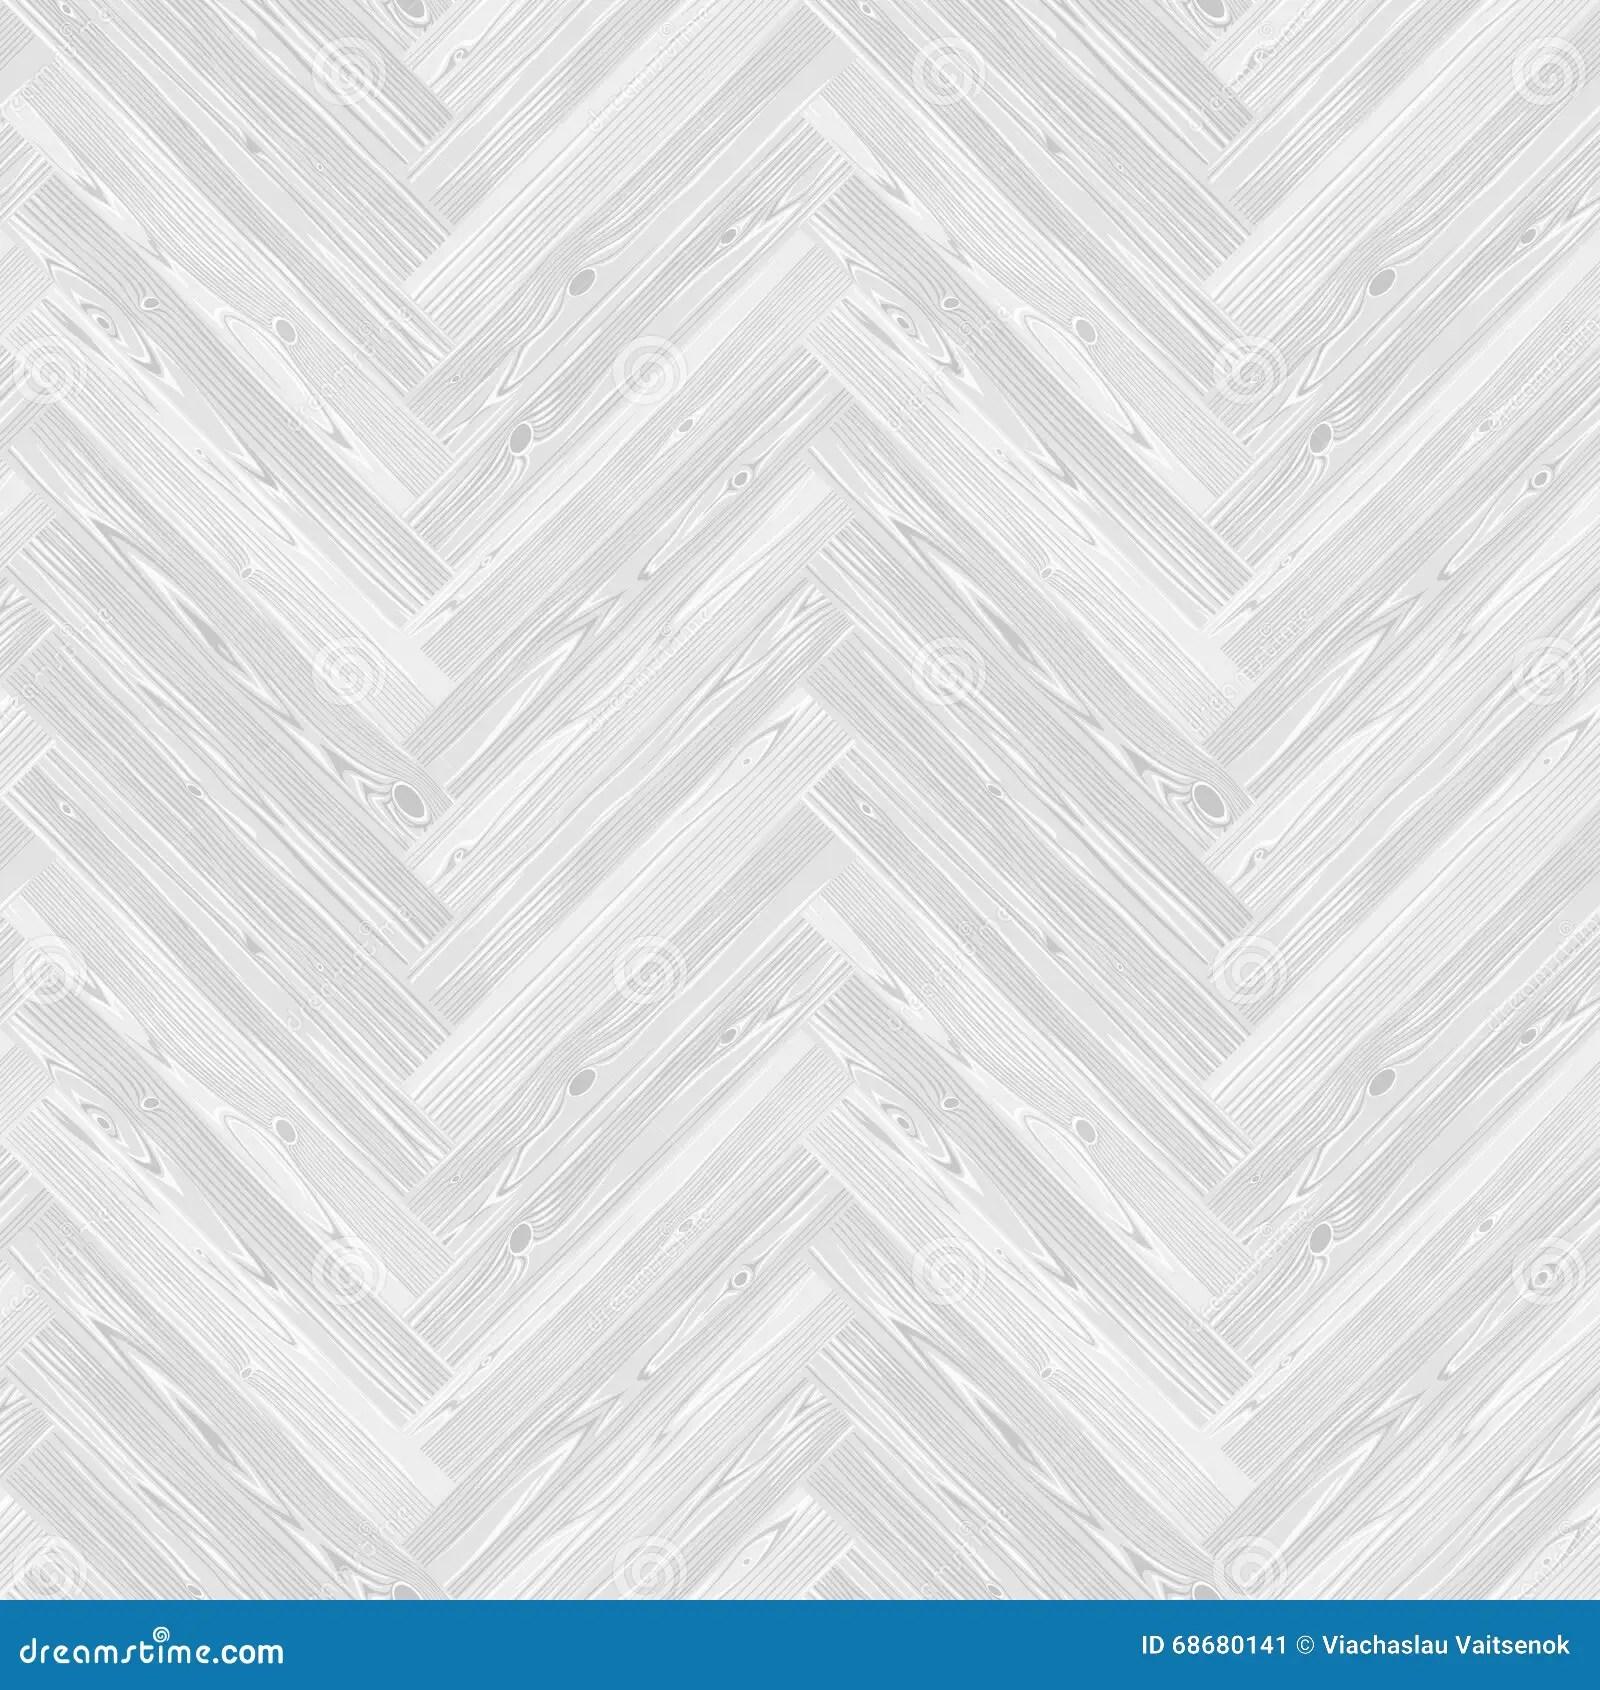 White Herringbone Parquet Floor Seamless Pattern Stock